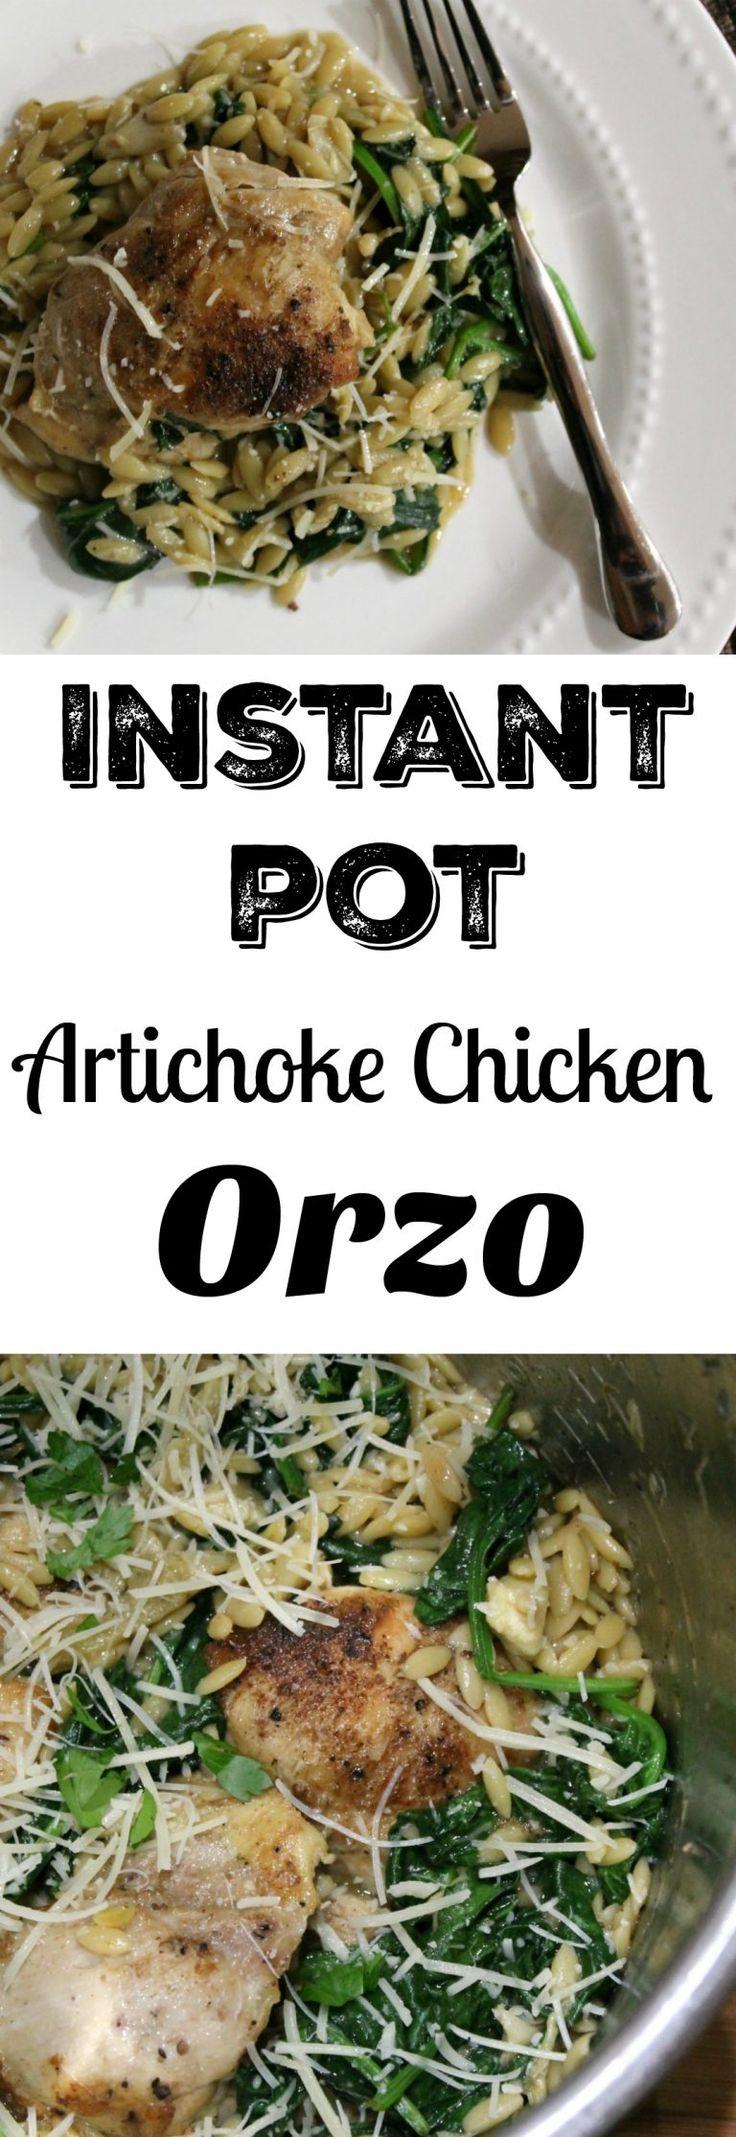 Instant Pot Artichoke Chicken Orzo Dinner - One Pot Recipe